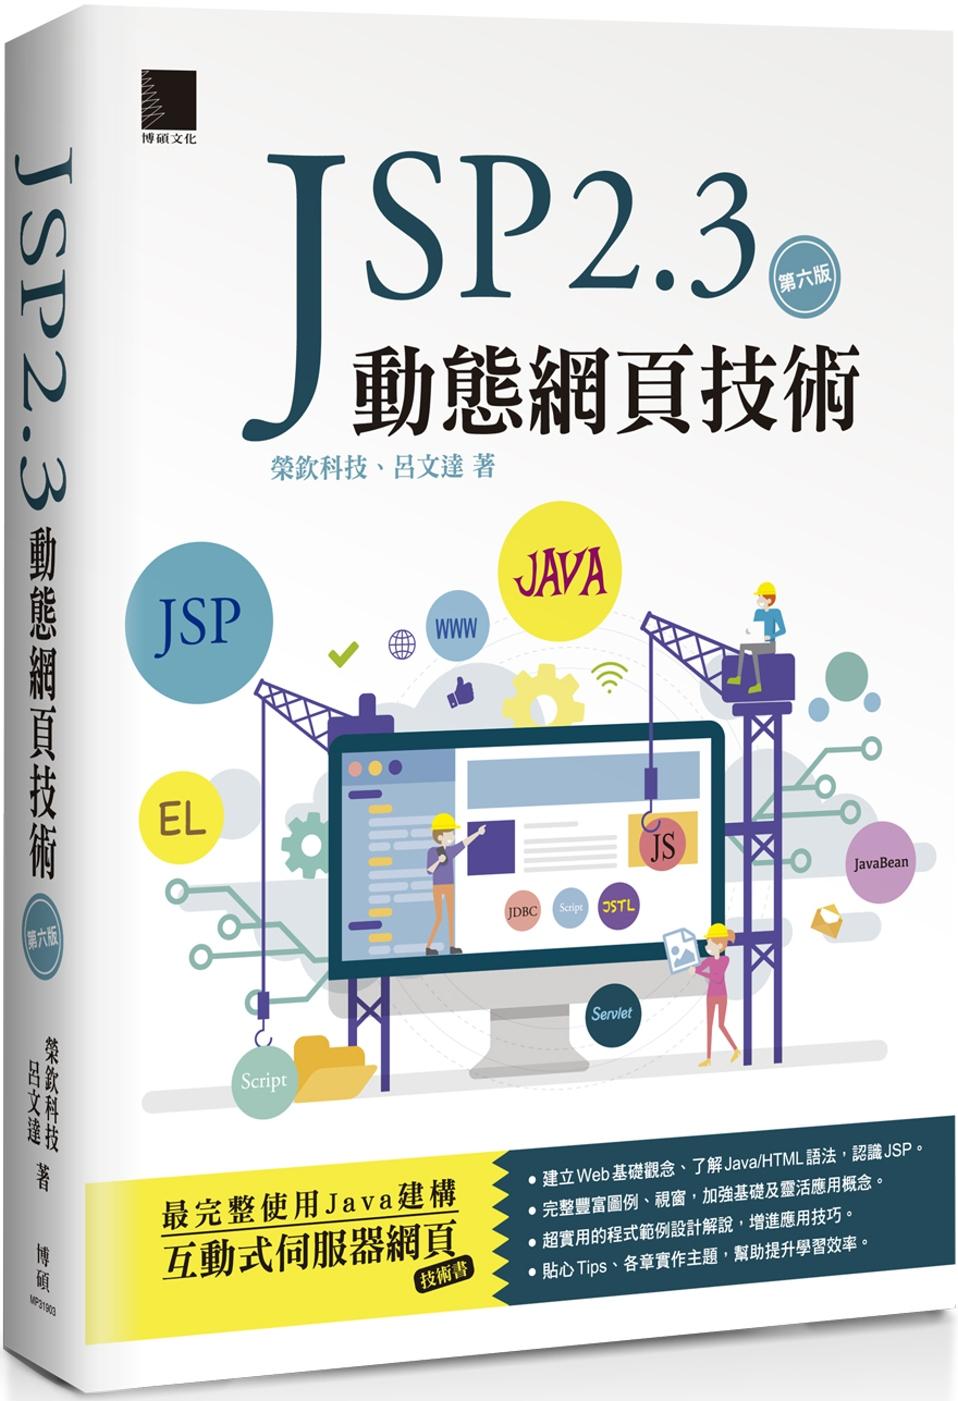 JSP 2.3動...